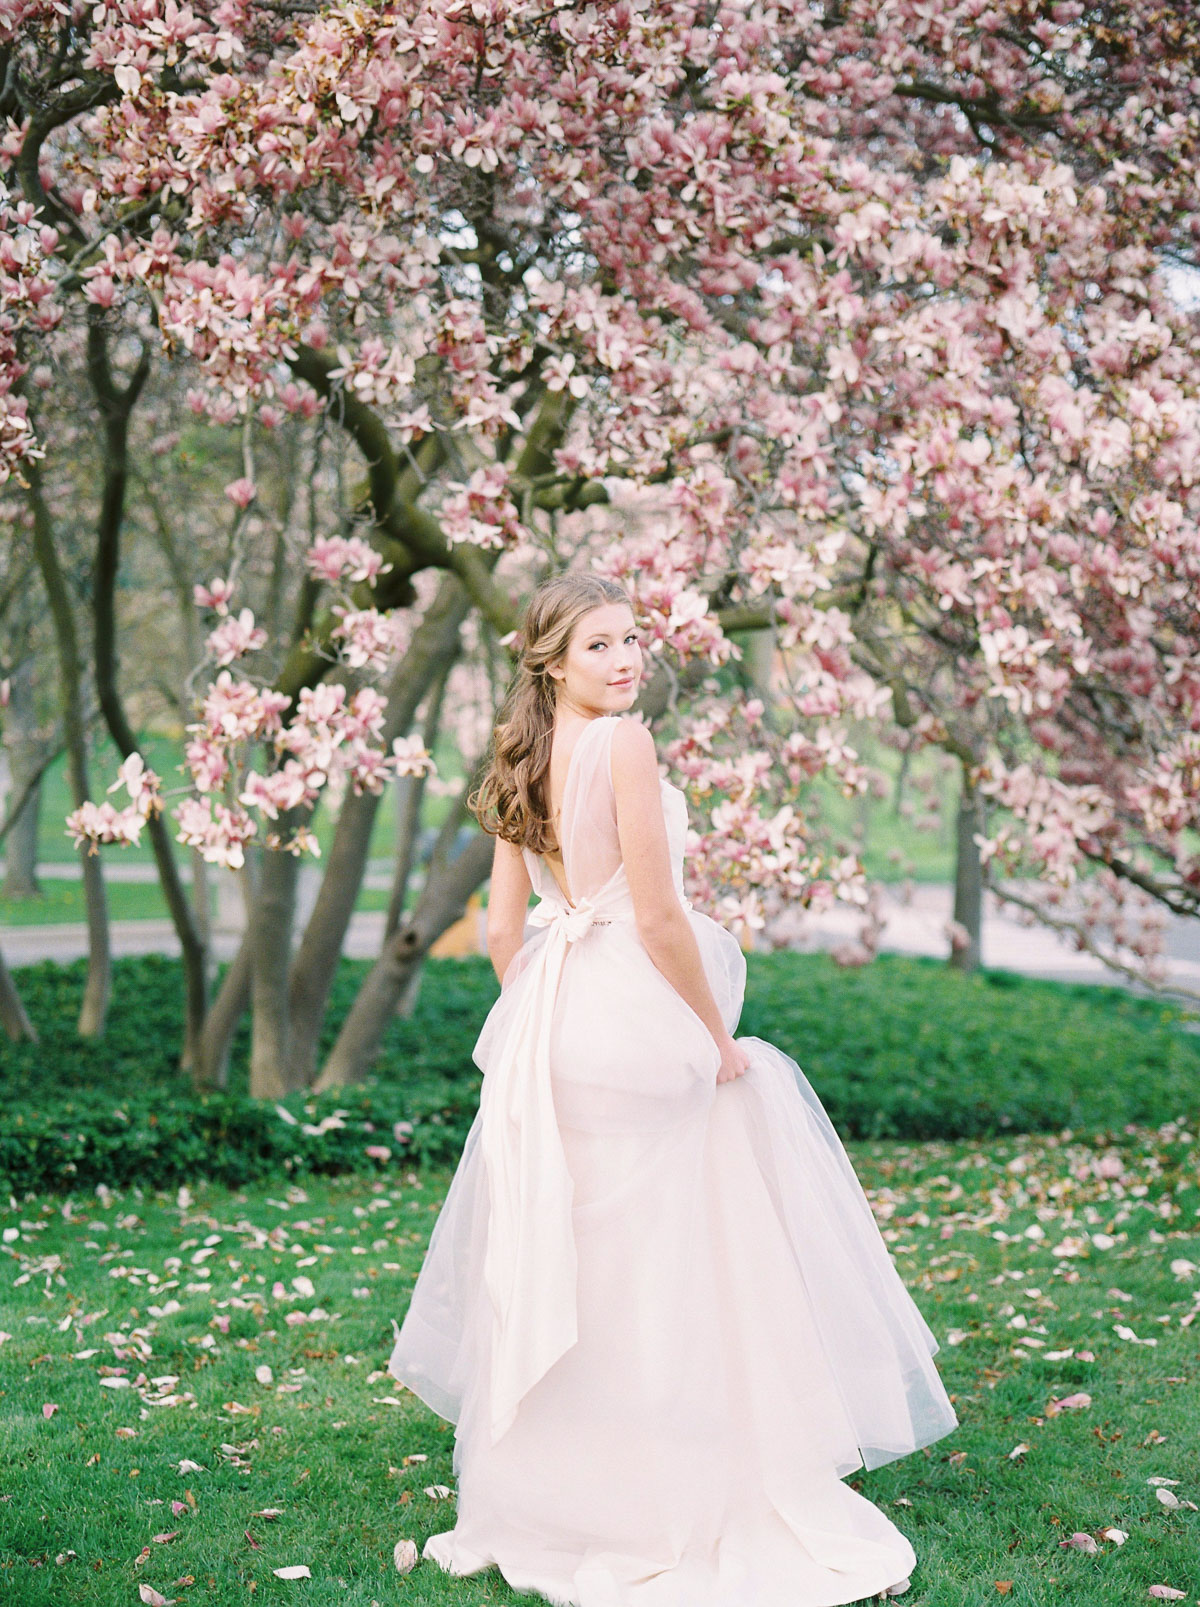 julia-park-photography-vineyard-bride-swish-list-niagara-on-the-lake-wedding-editorial-30.jpg